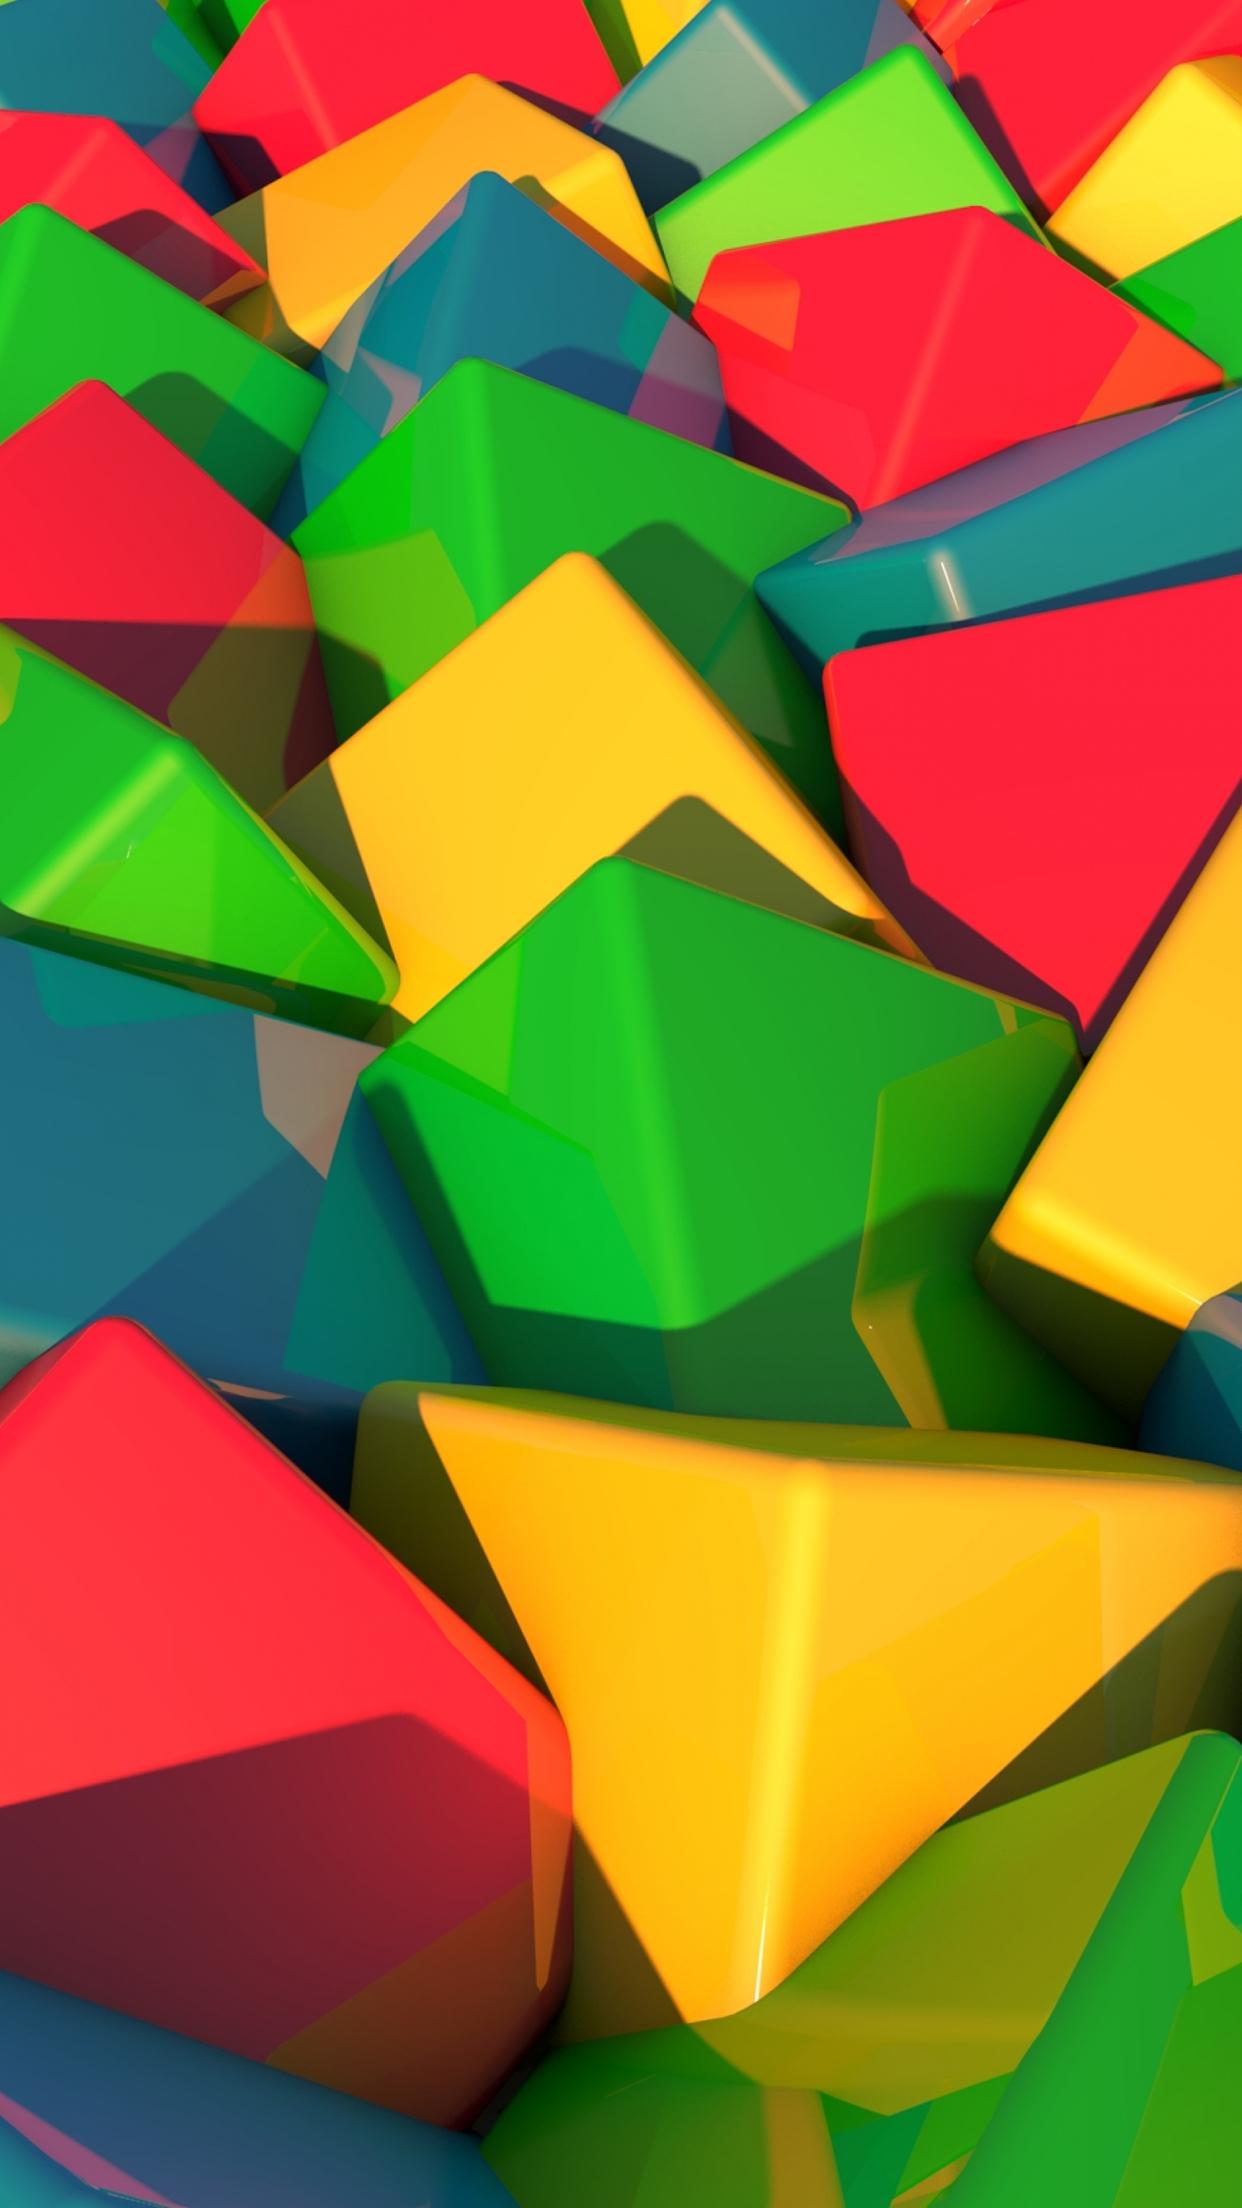 Multicolor Blocs 3Wallpapers iPhone Parallax Multicolor : Blocs